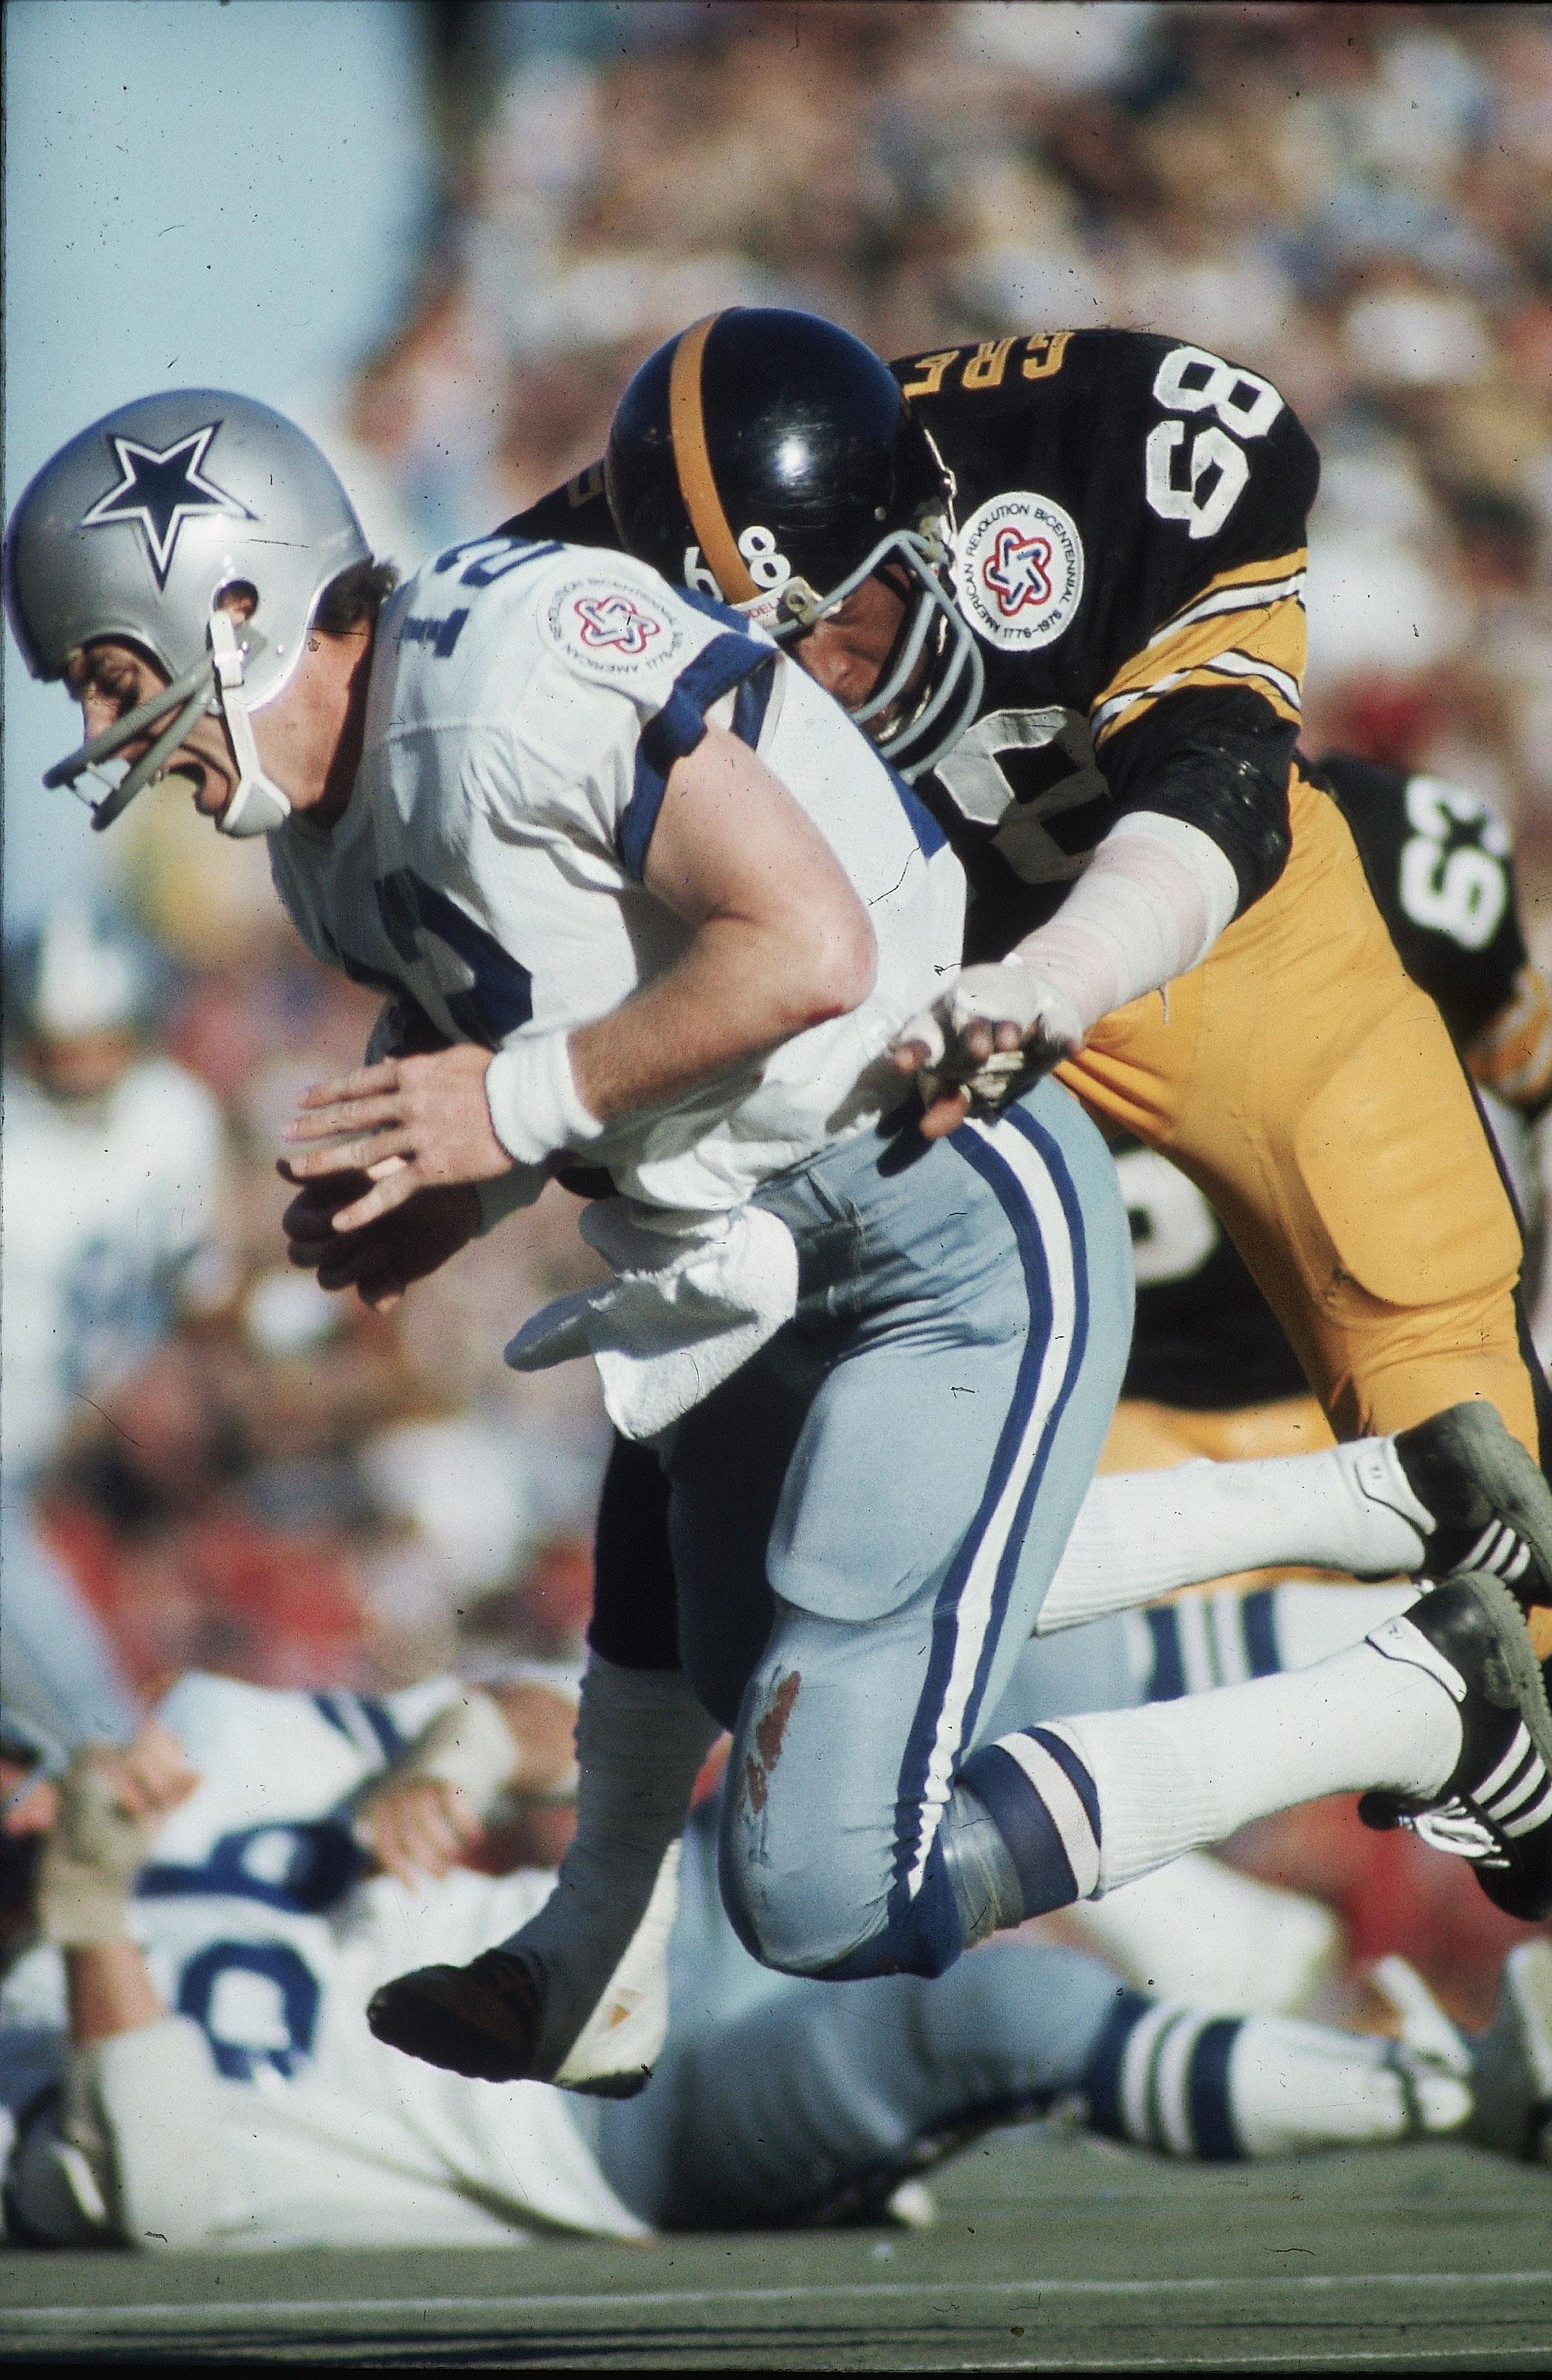 Super Bowl X, Jan. 18, 1976                               Pittsburgh Steelers vs Dallas Cowboys in Miami